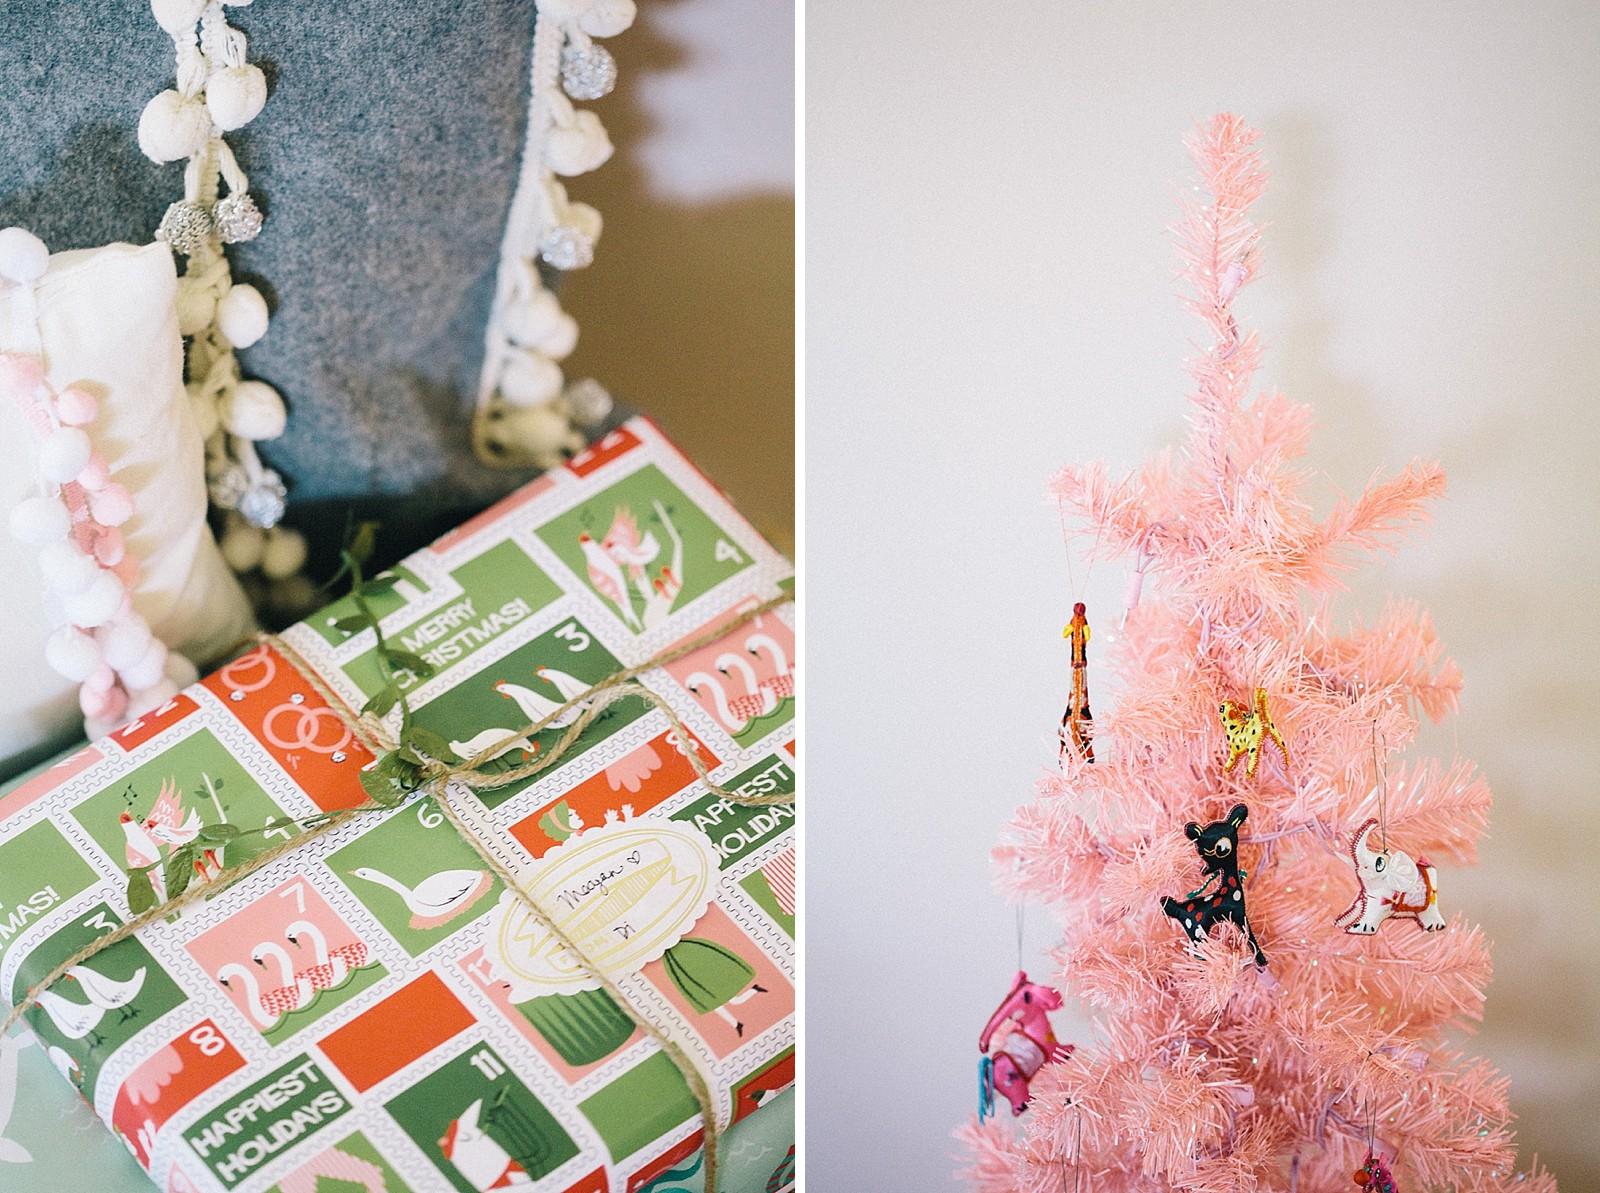 minted-christmas-inspiration-girls-party-photos-diana-elizabeth-blog-lifestyle-hostess-entertainment-home-blog-2299